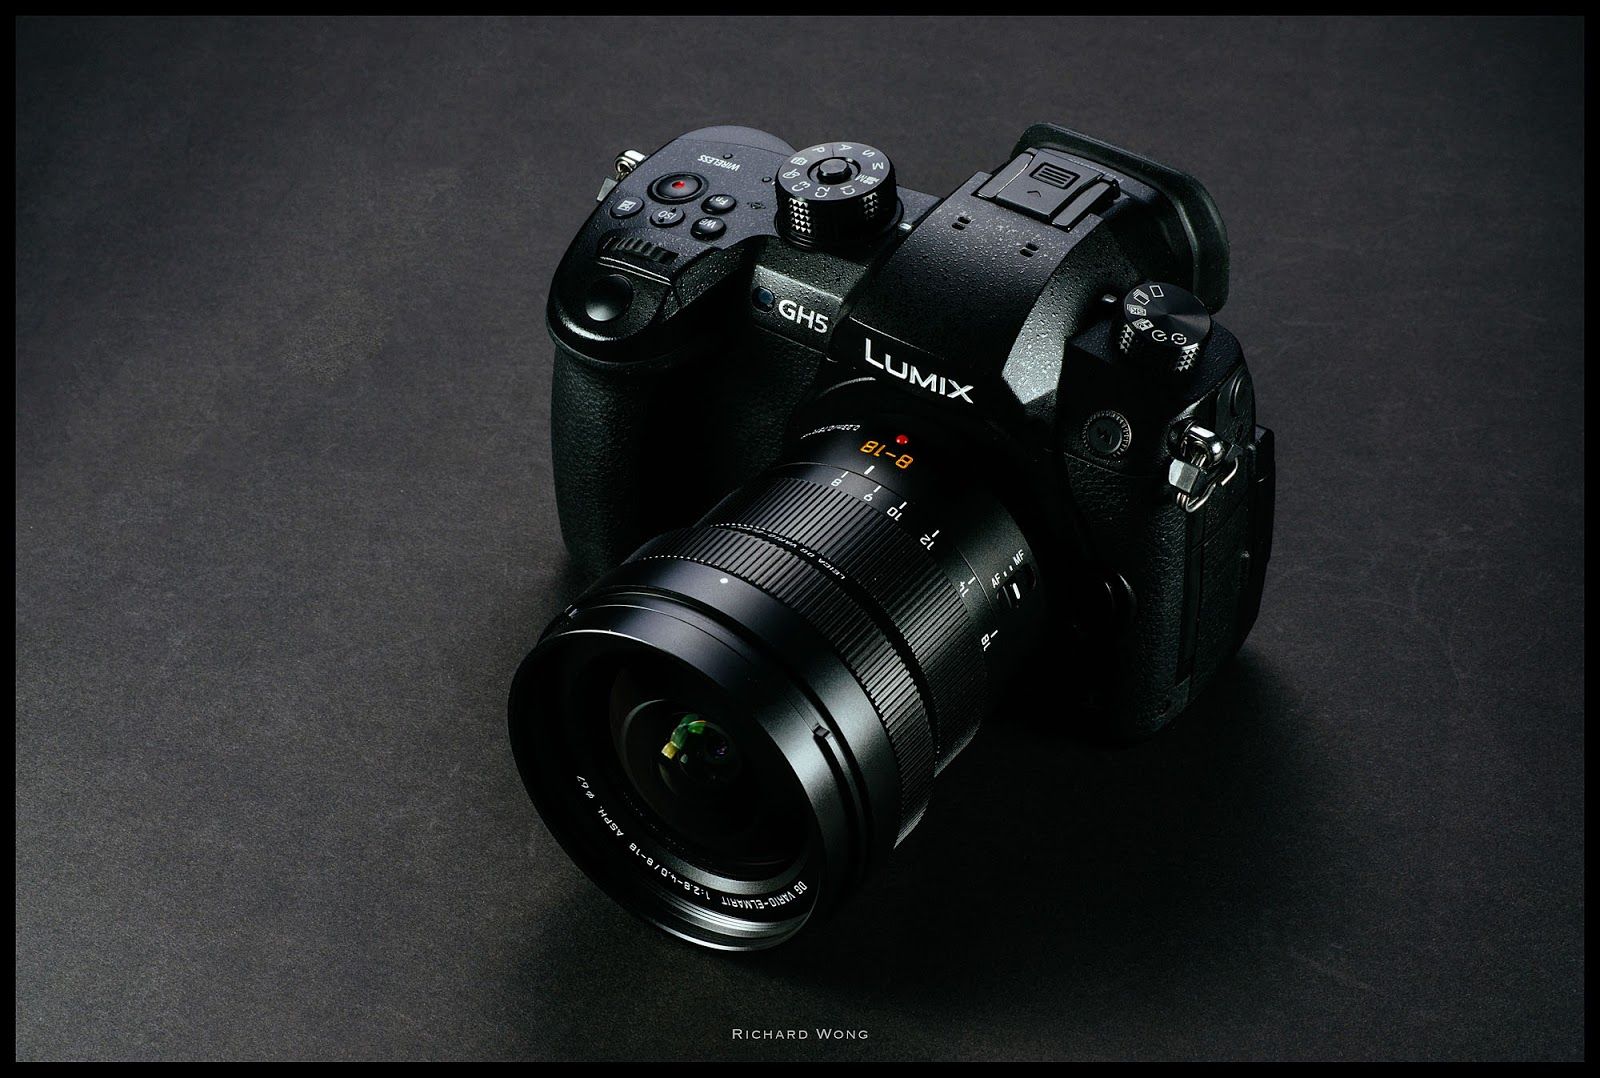 Leica DG Vario-Elmarit 8-18mm f/2.8-4.0 Asph и Panasonic Lumix GH5